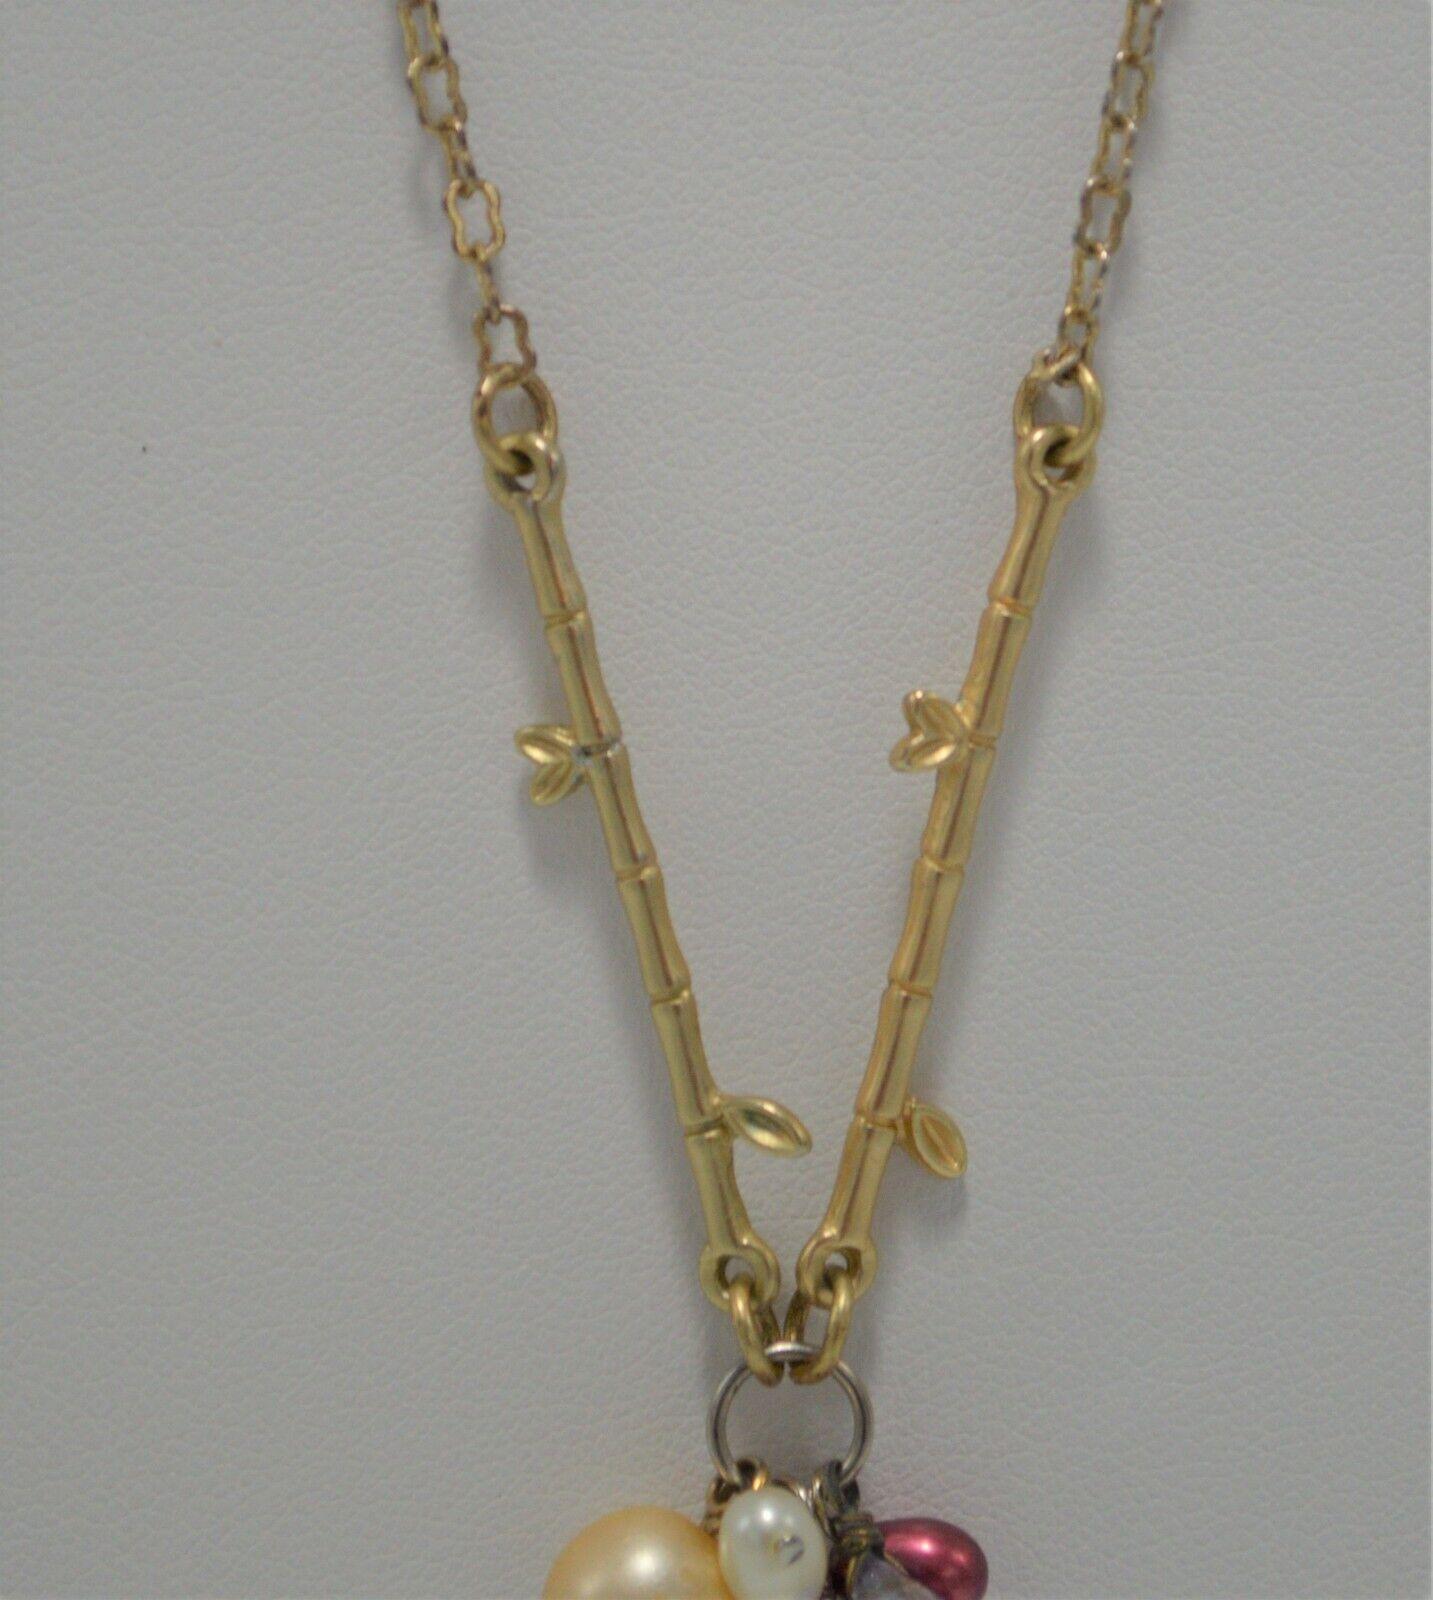 Yellow Orange Amber Butterfly Charm Pendant Bead Chain Necklace Hook Drop Dangle Earring Jewellery Set